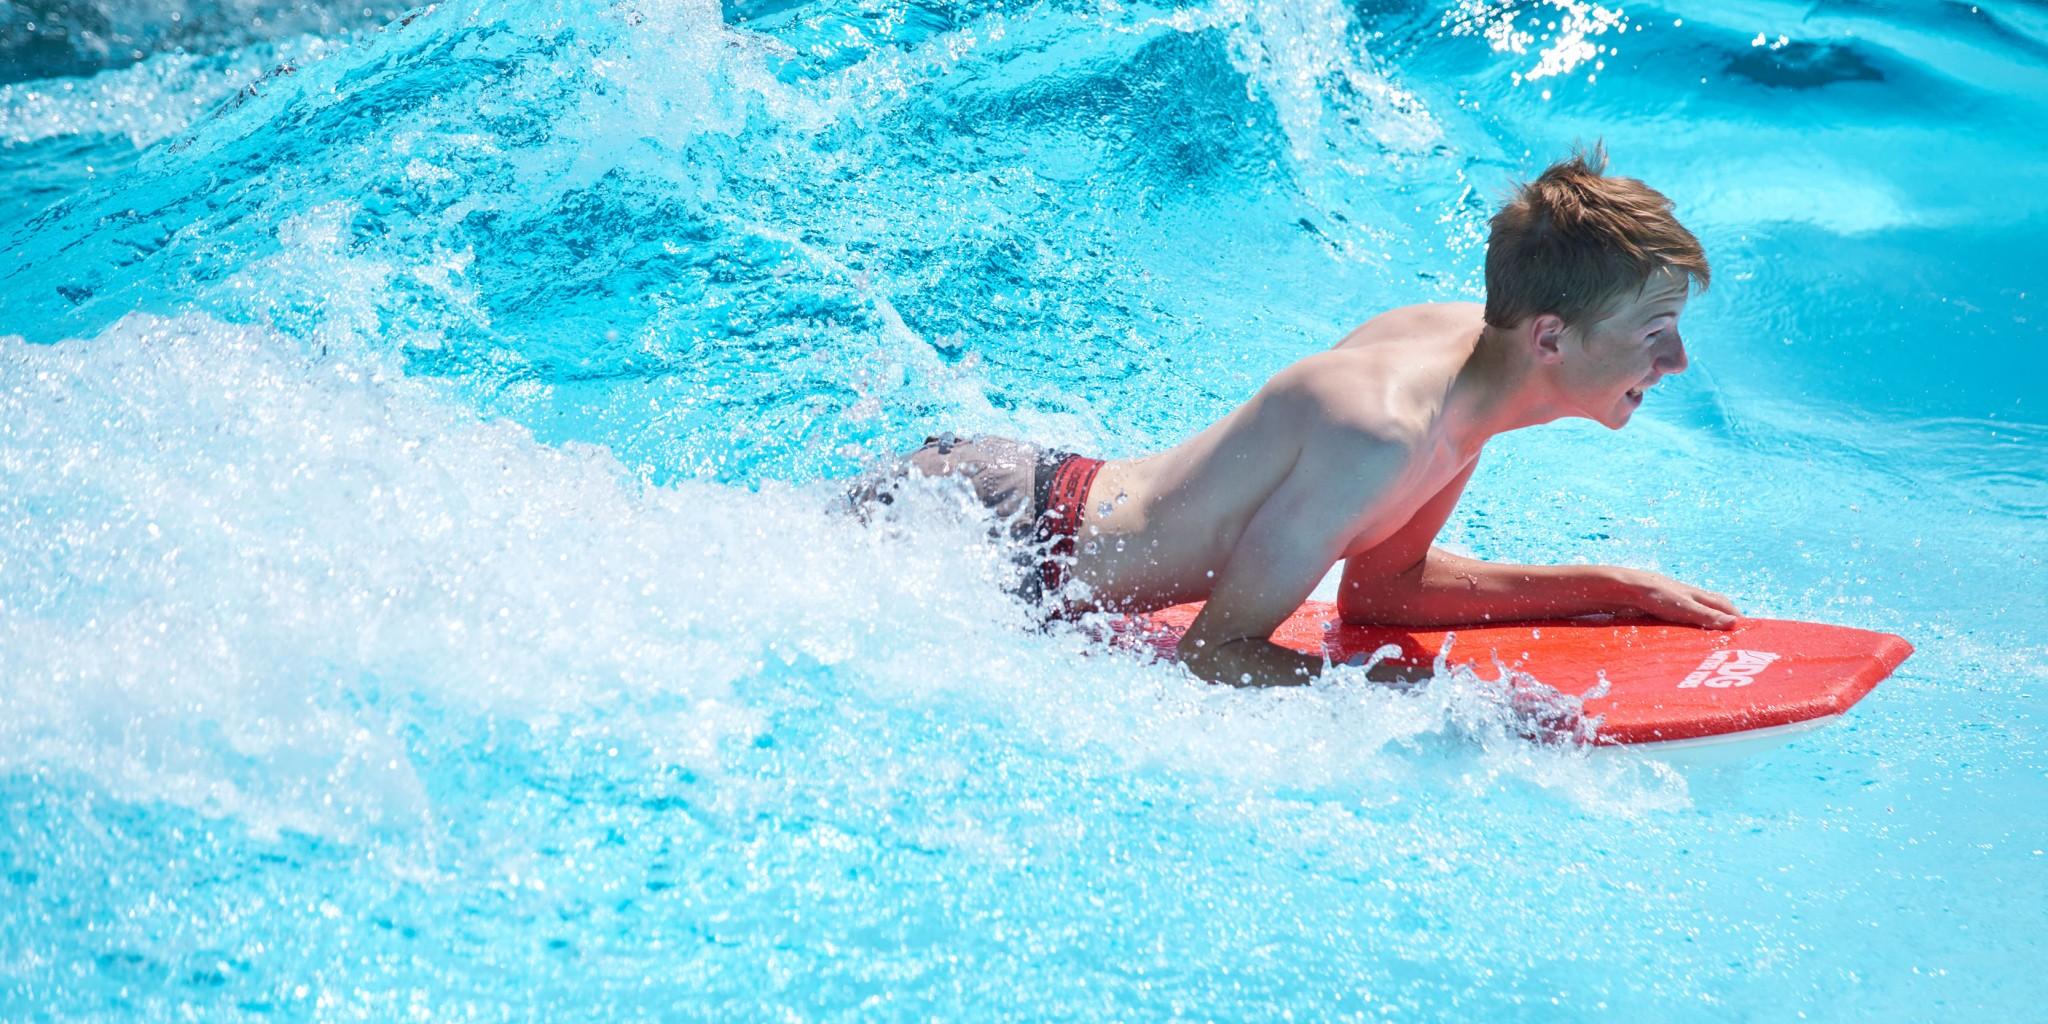 Boy on a boogie board in a wave pool